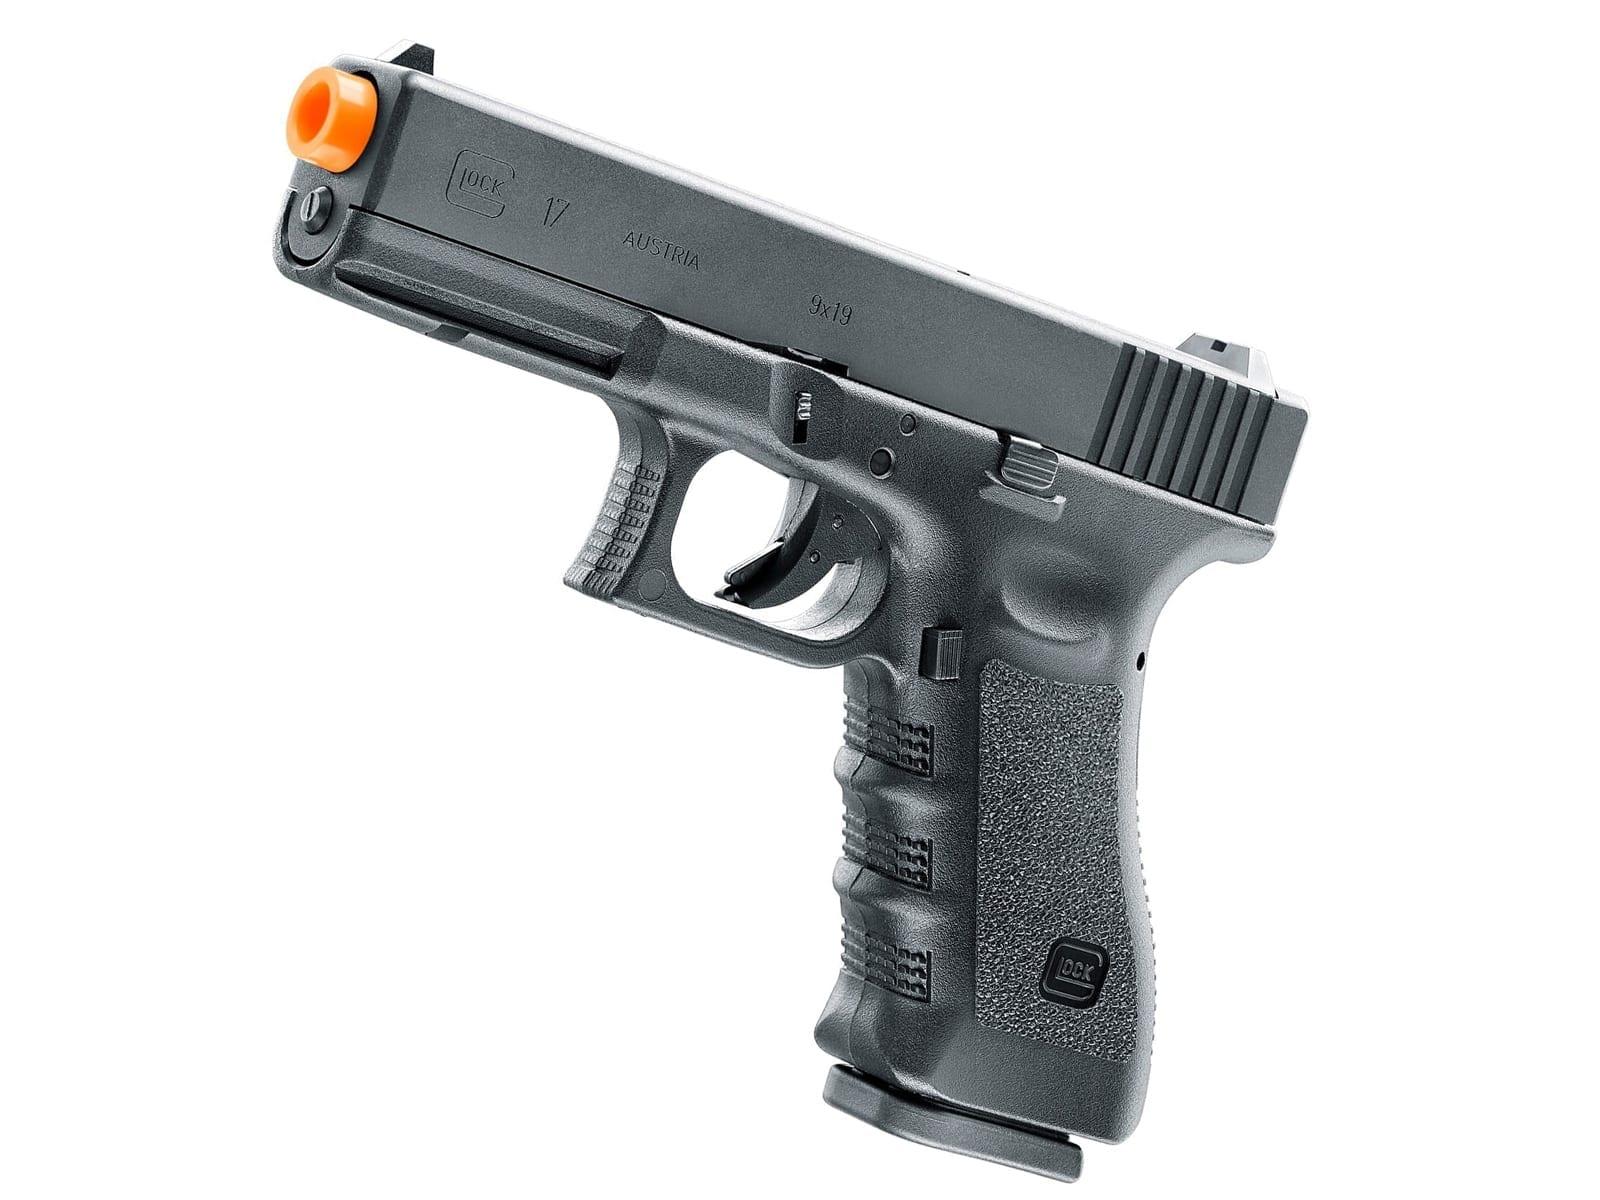 umarex glock licensed airsott pistol